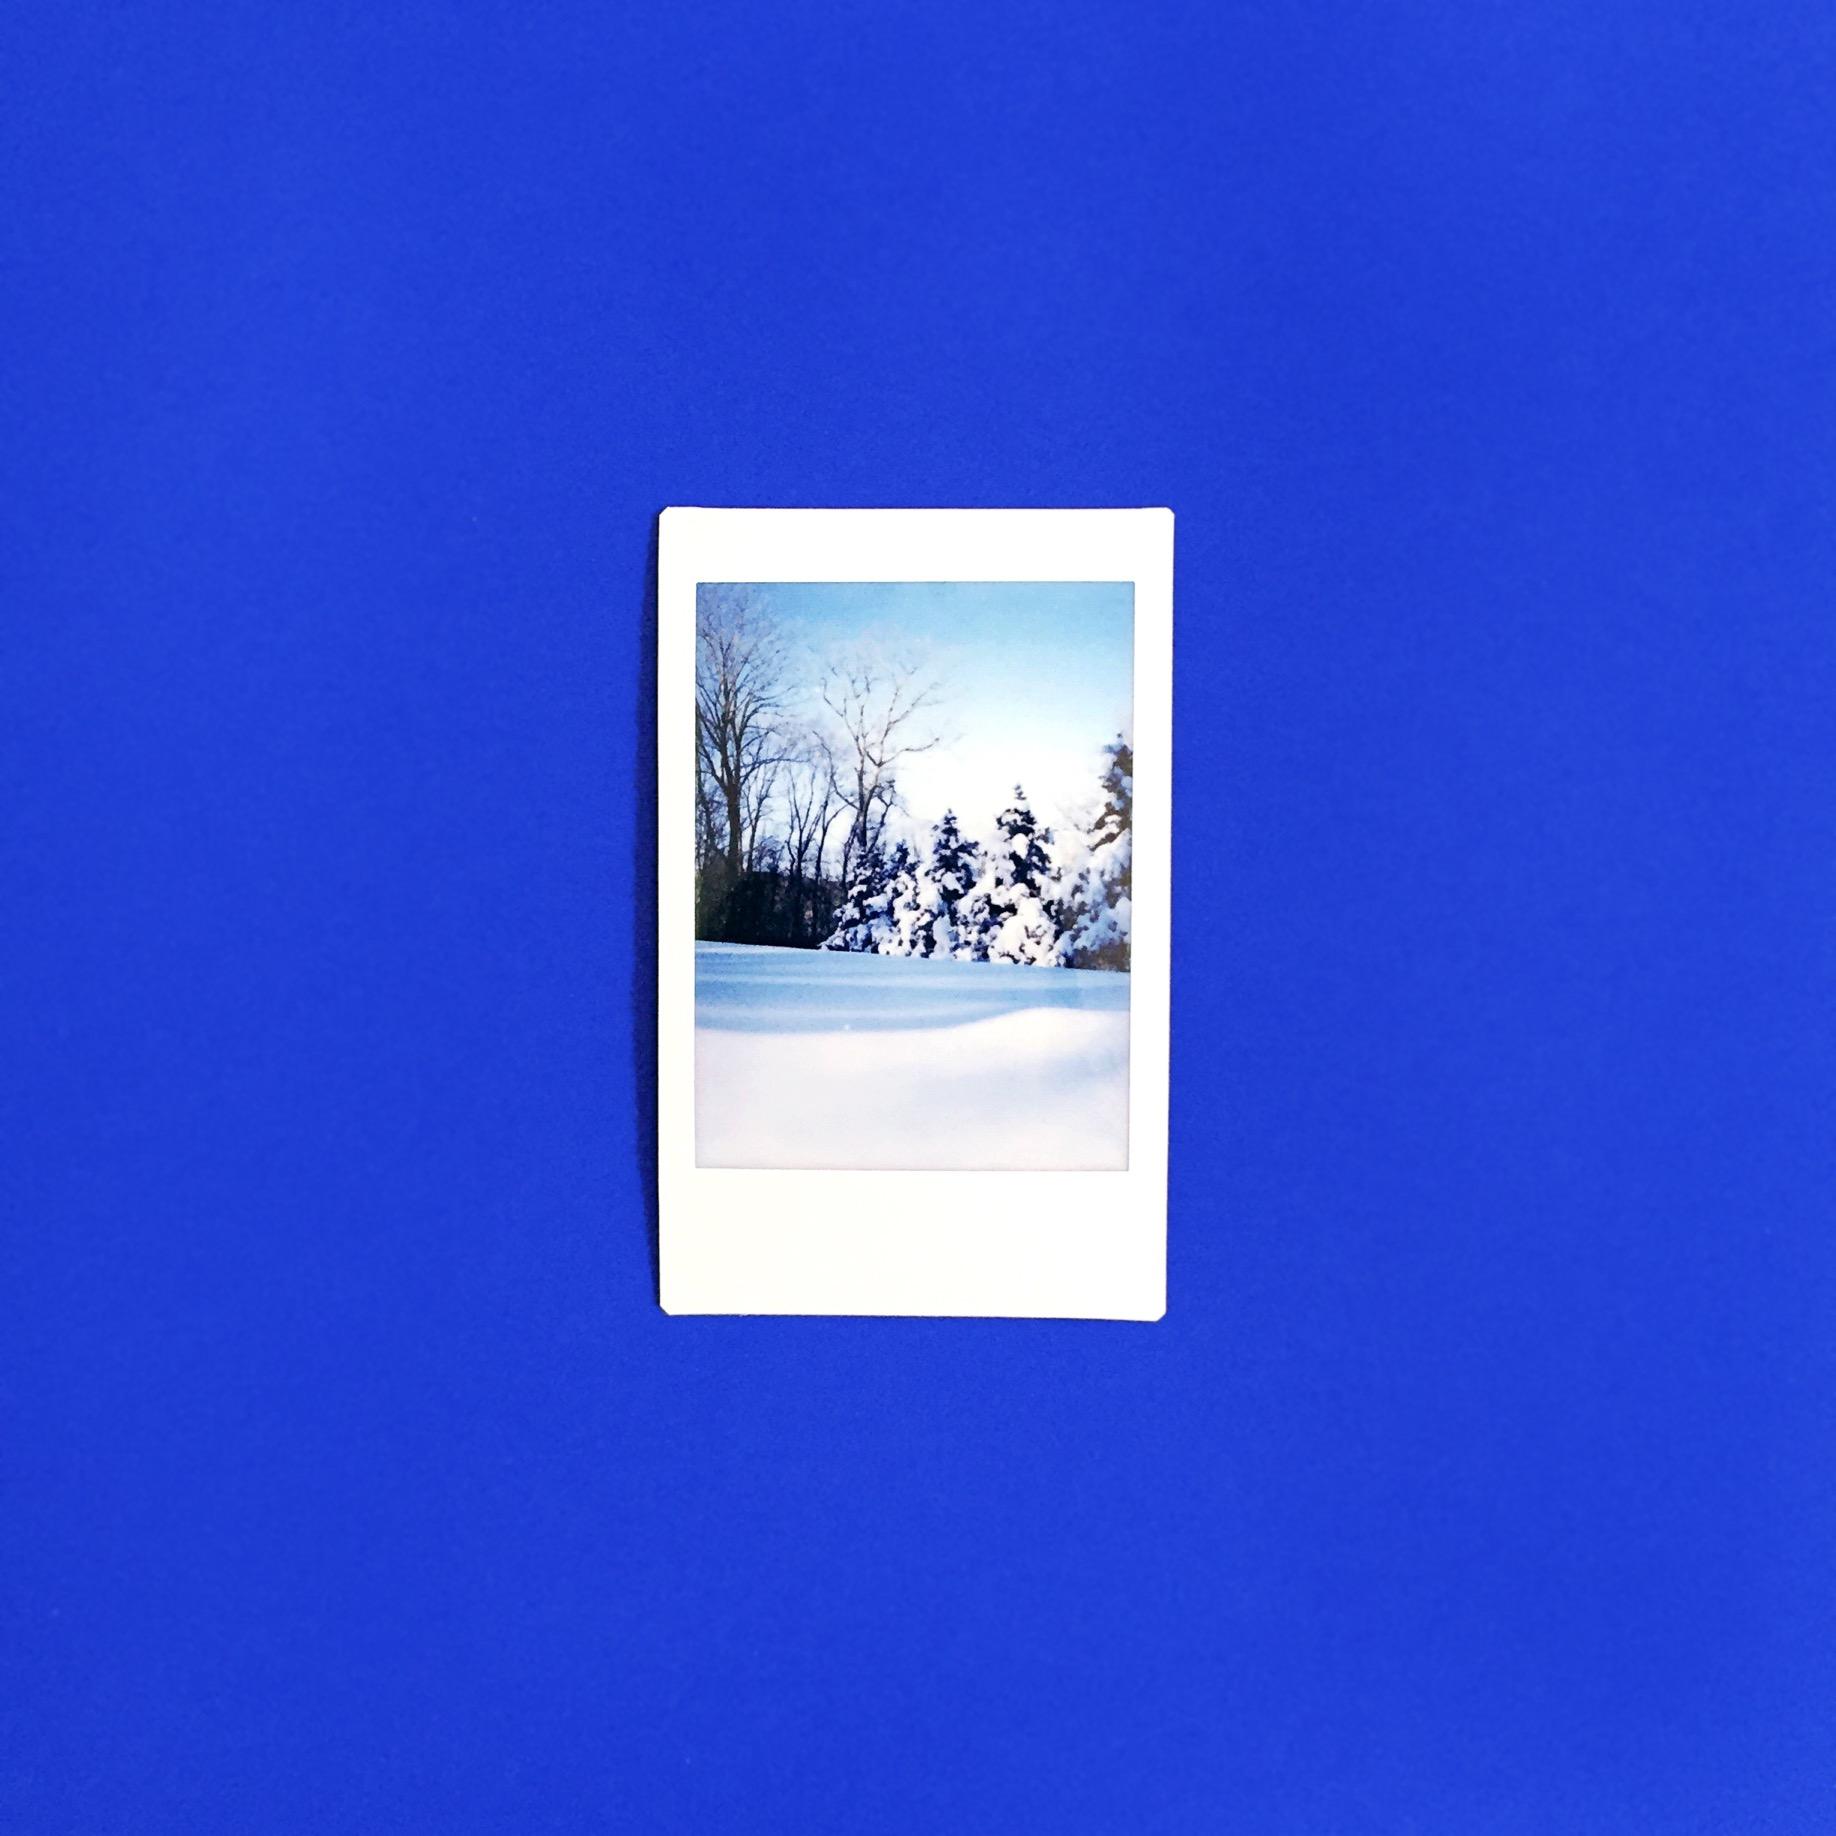 amy_chen_design_blog_winter_polaroid.jpeg